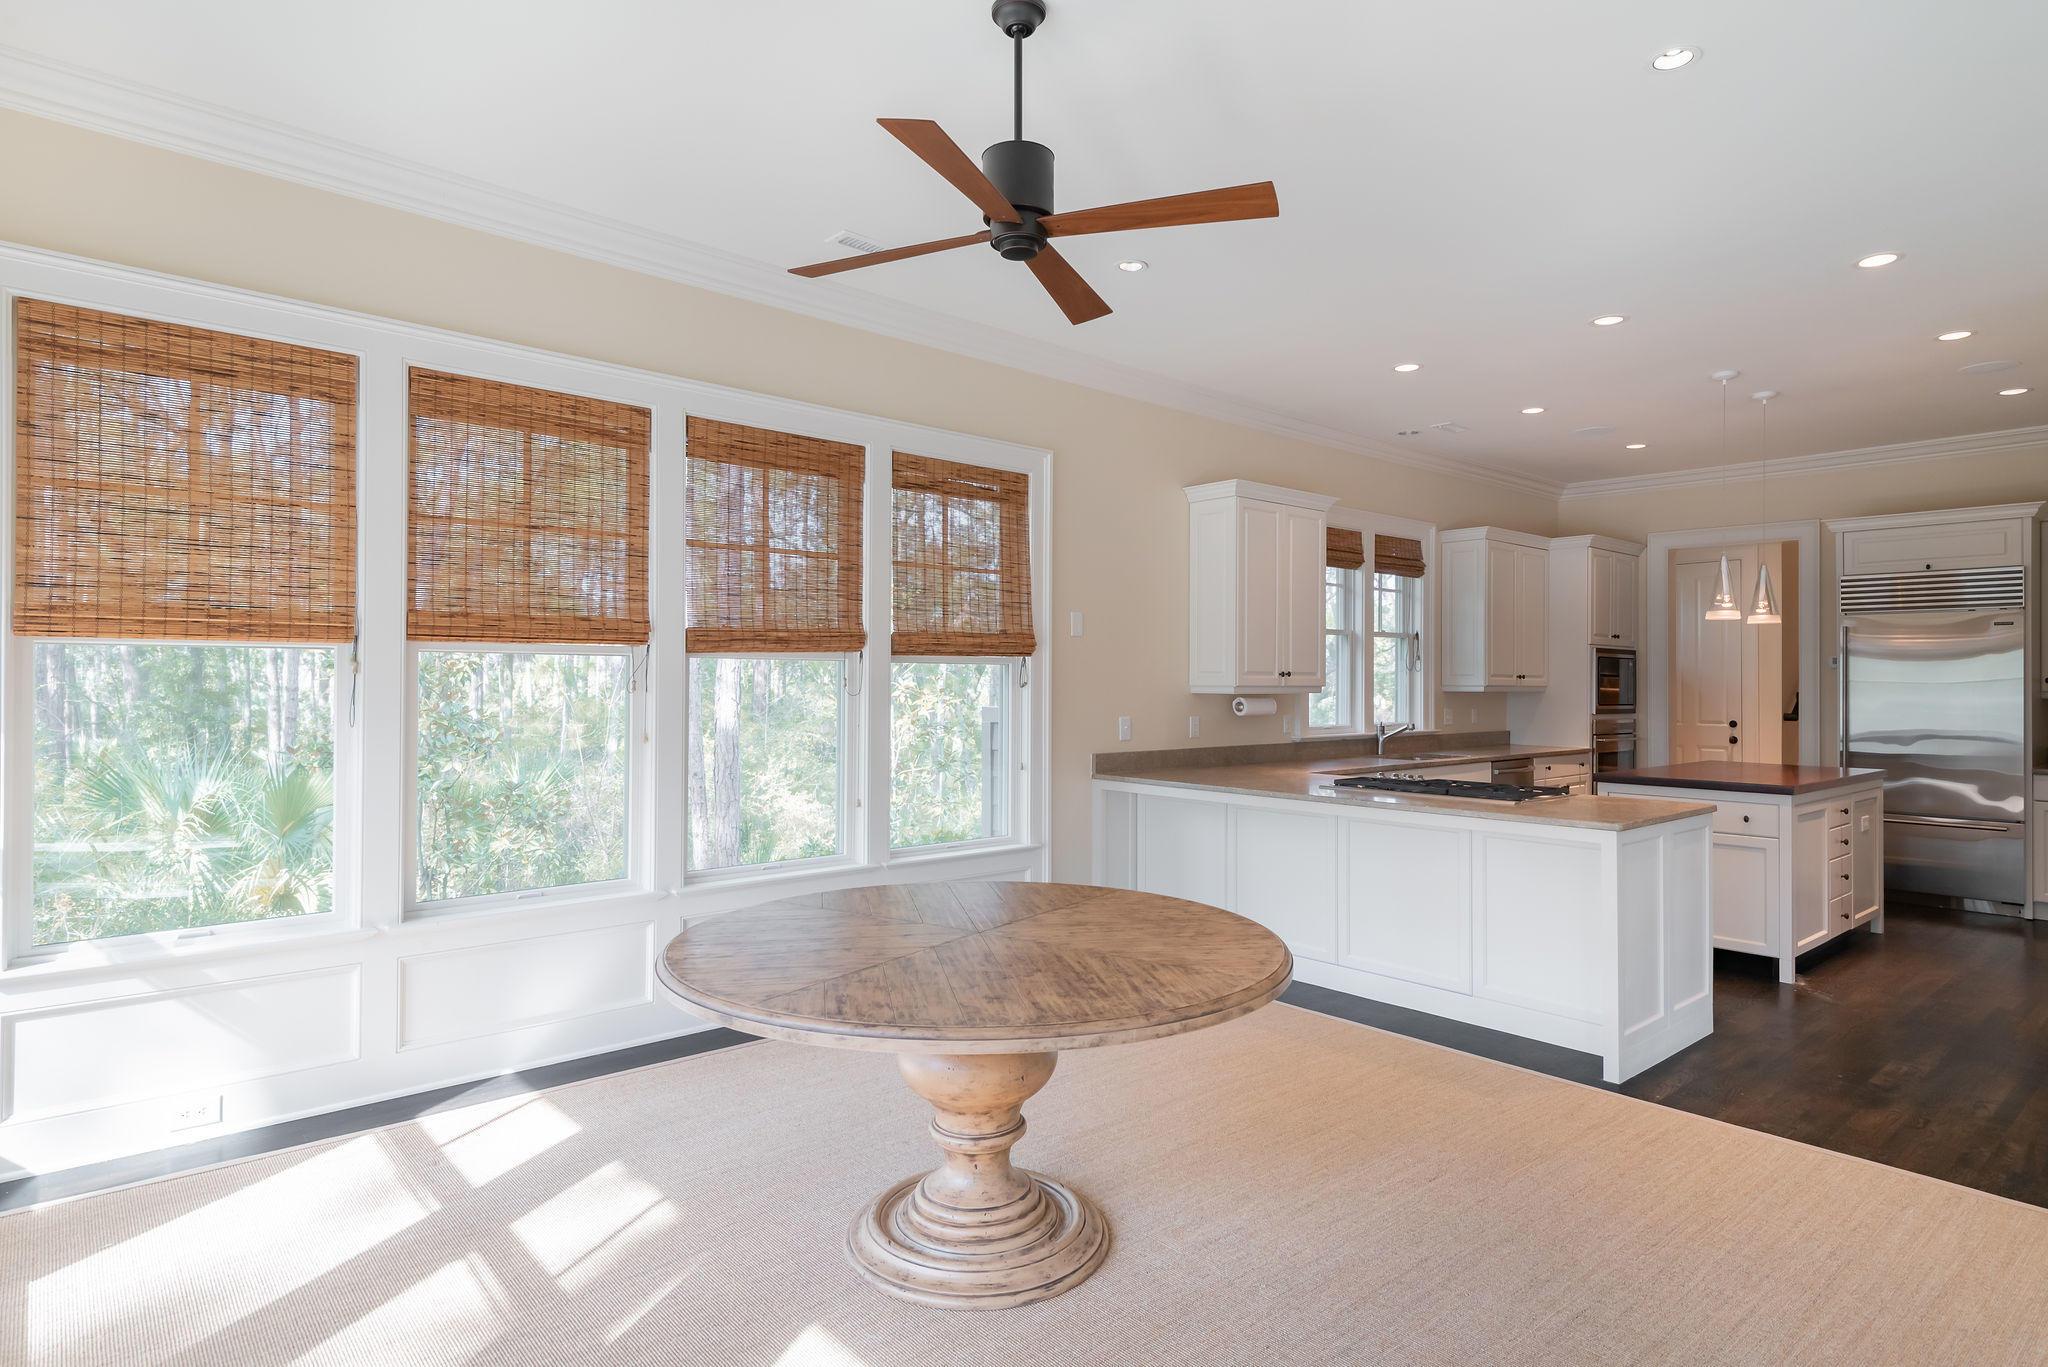 Kiawah Island Homes For Sale - 3 Grey Widgeon, Kiawah Island, SC - 45